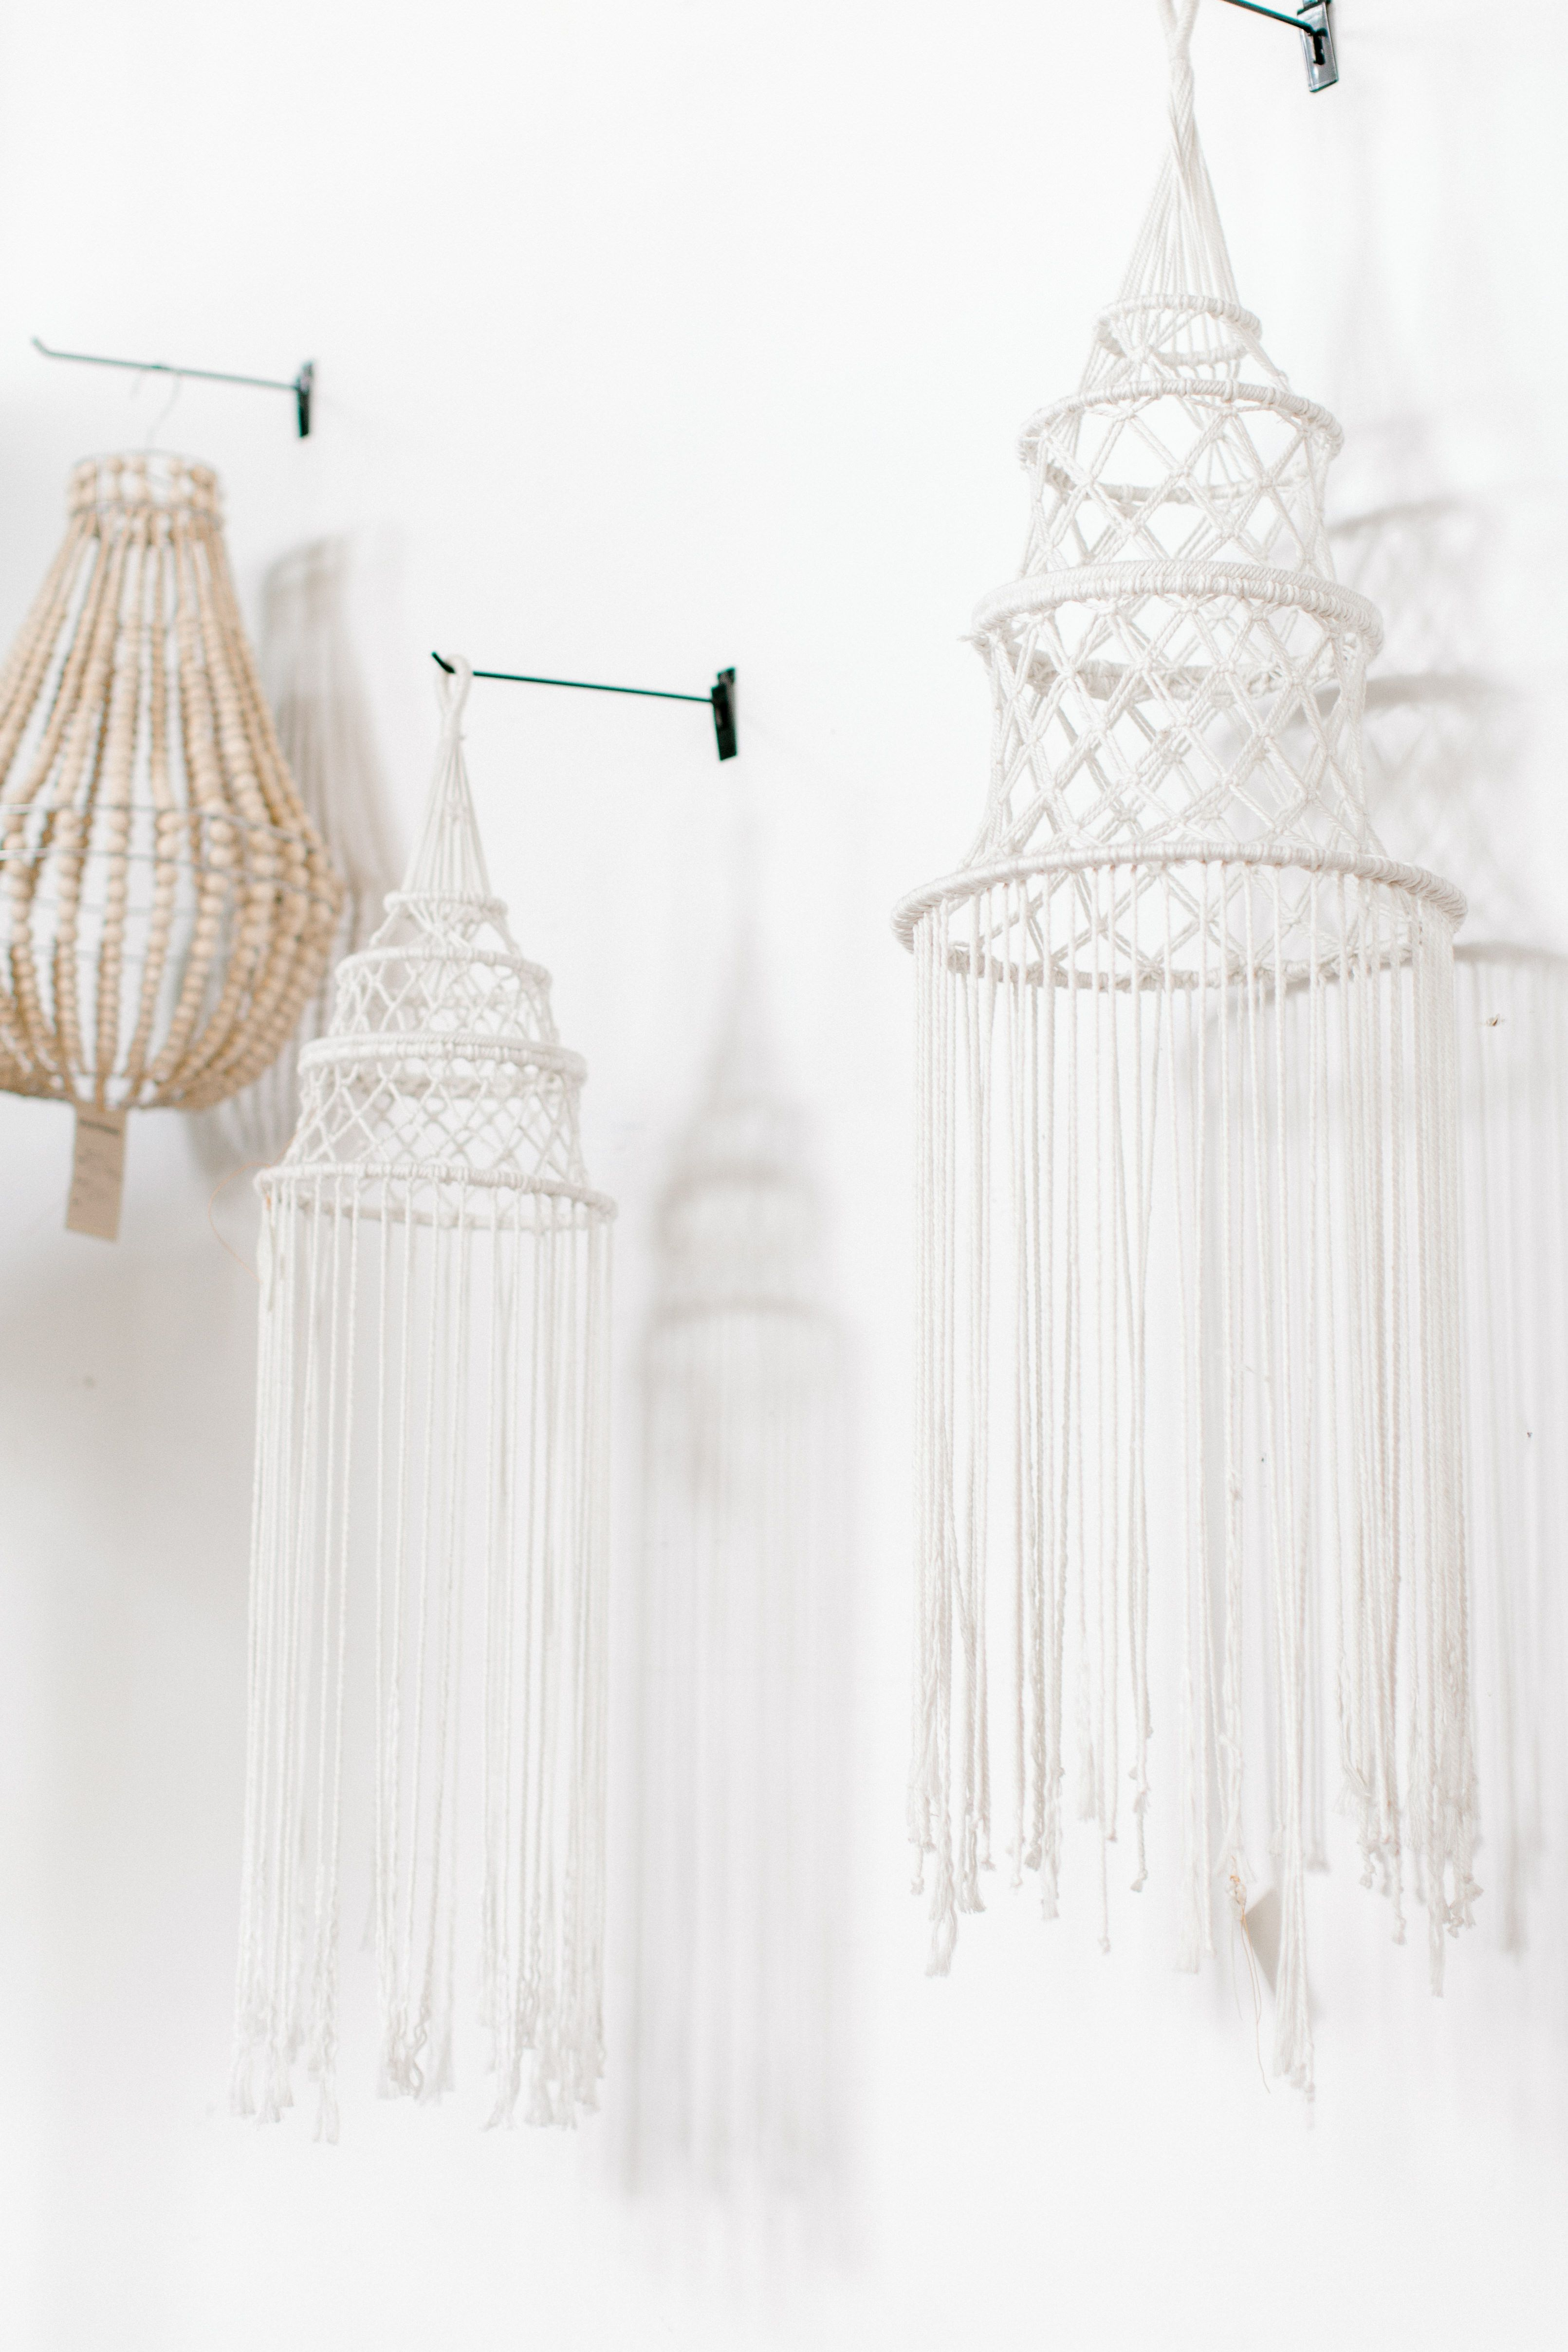 White macramé hangers and wall decor artisanfurniture